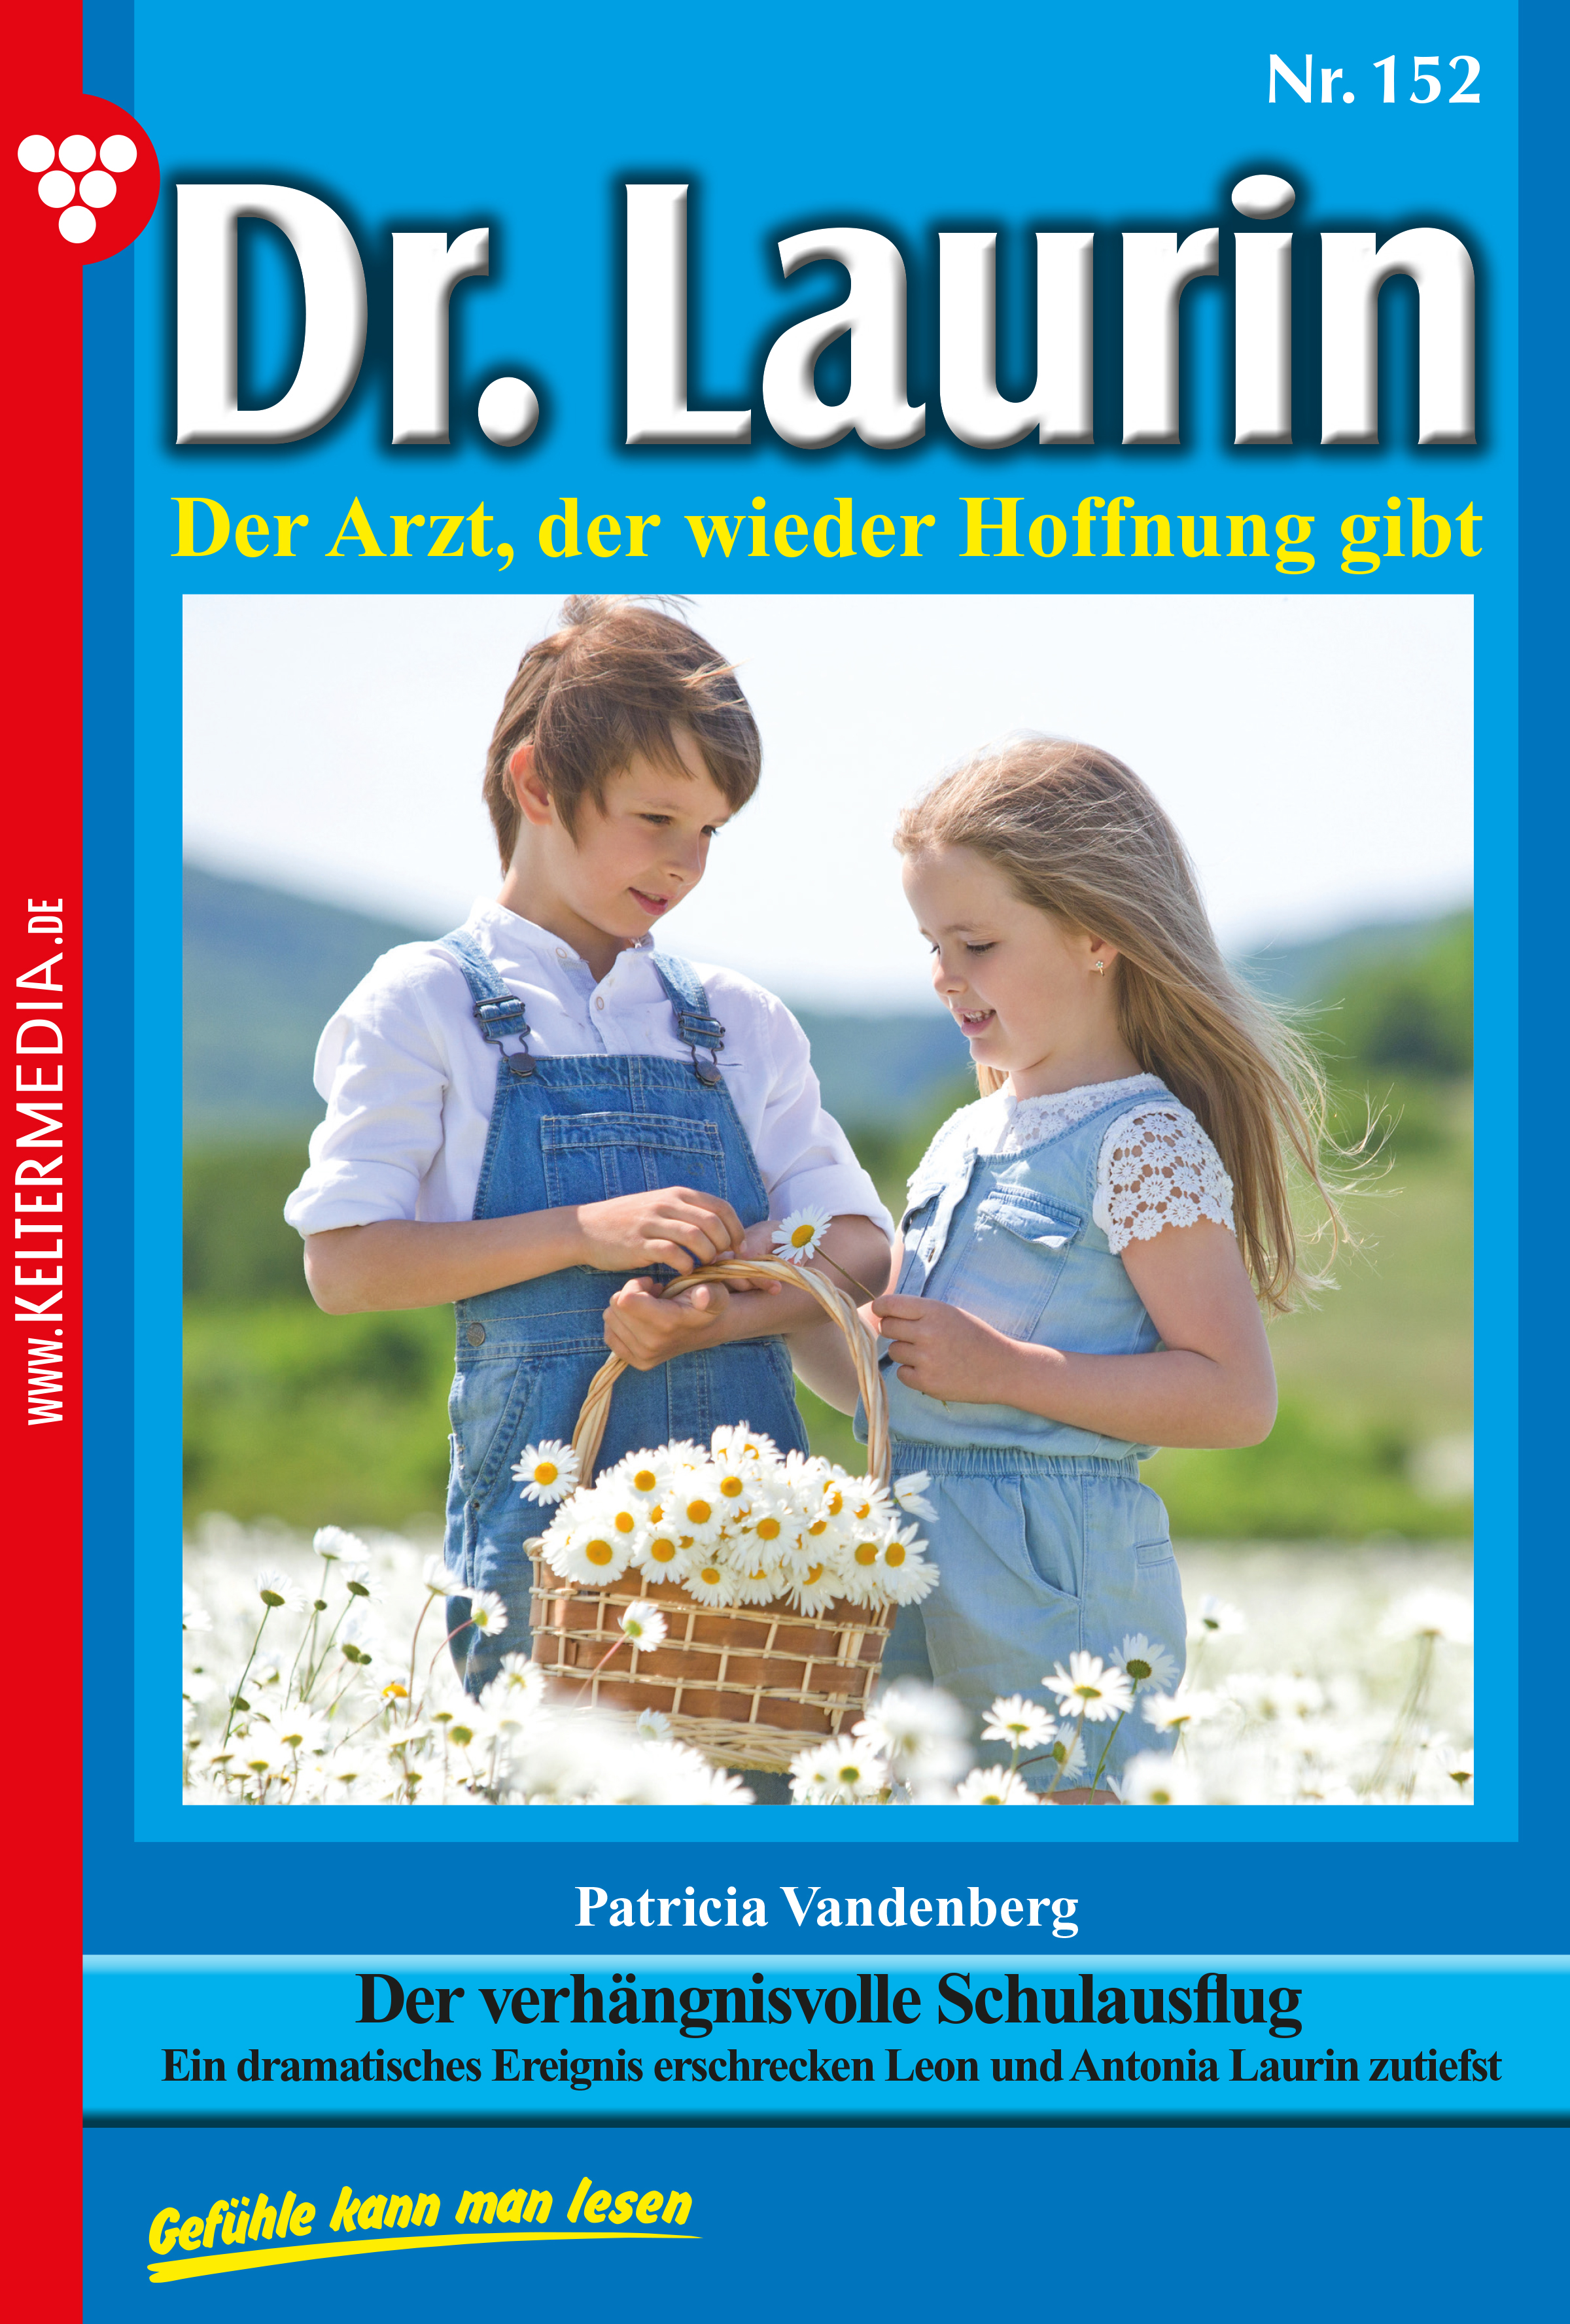 цена на Patricia Vandenberg Dr. Laurin 152 – Arztroman